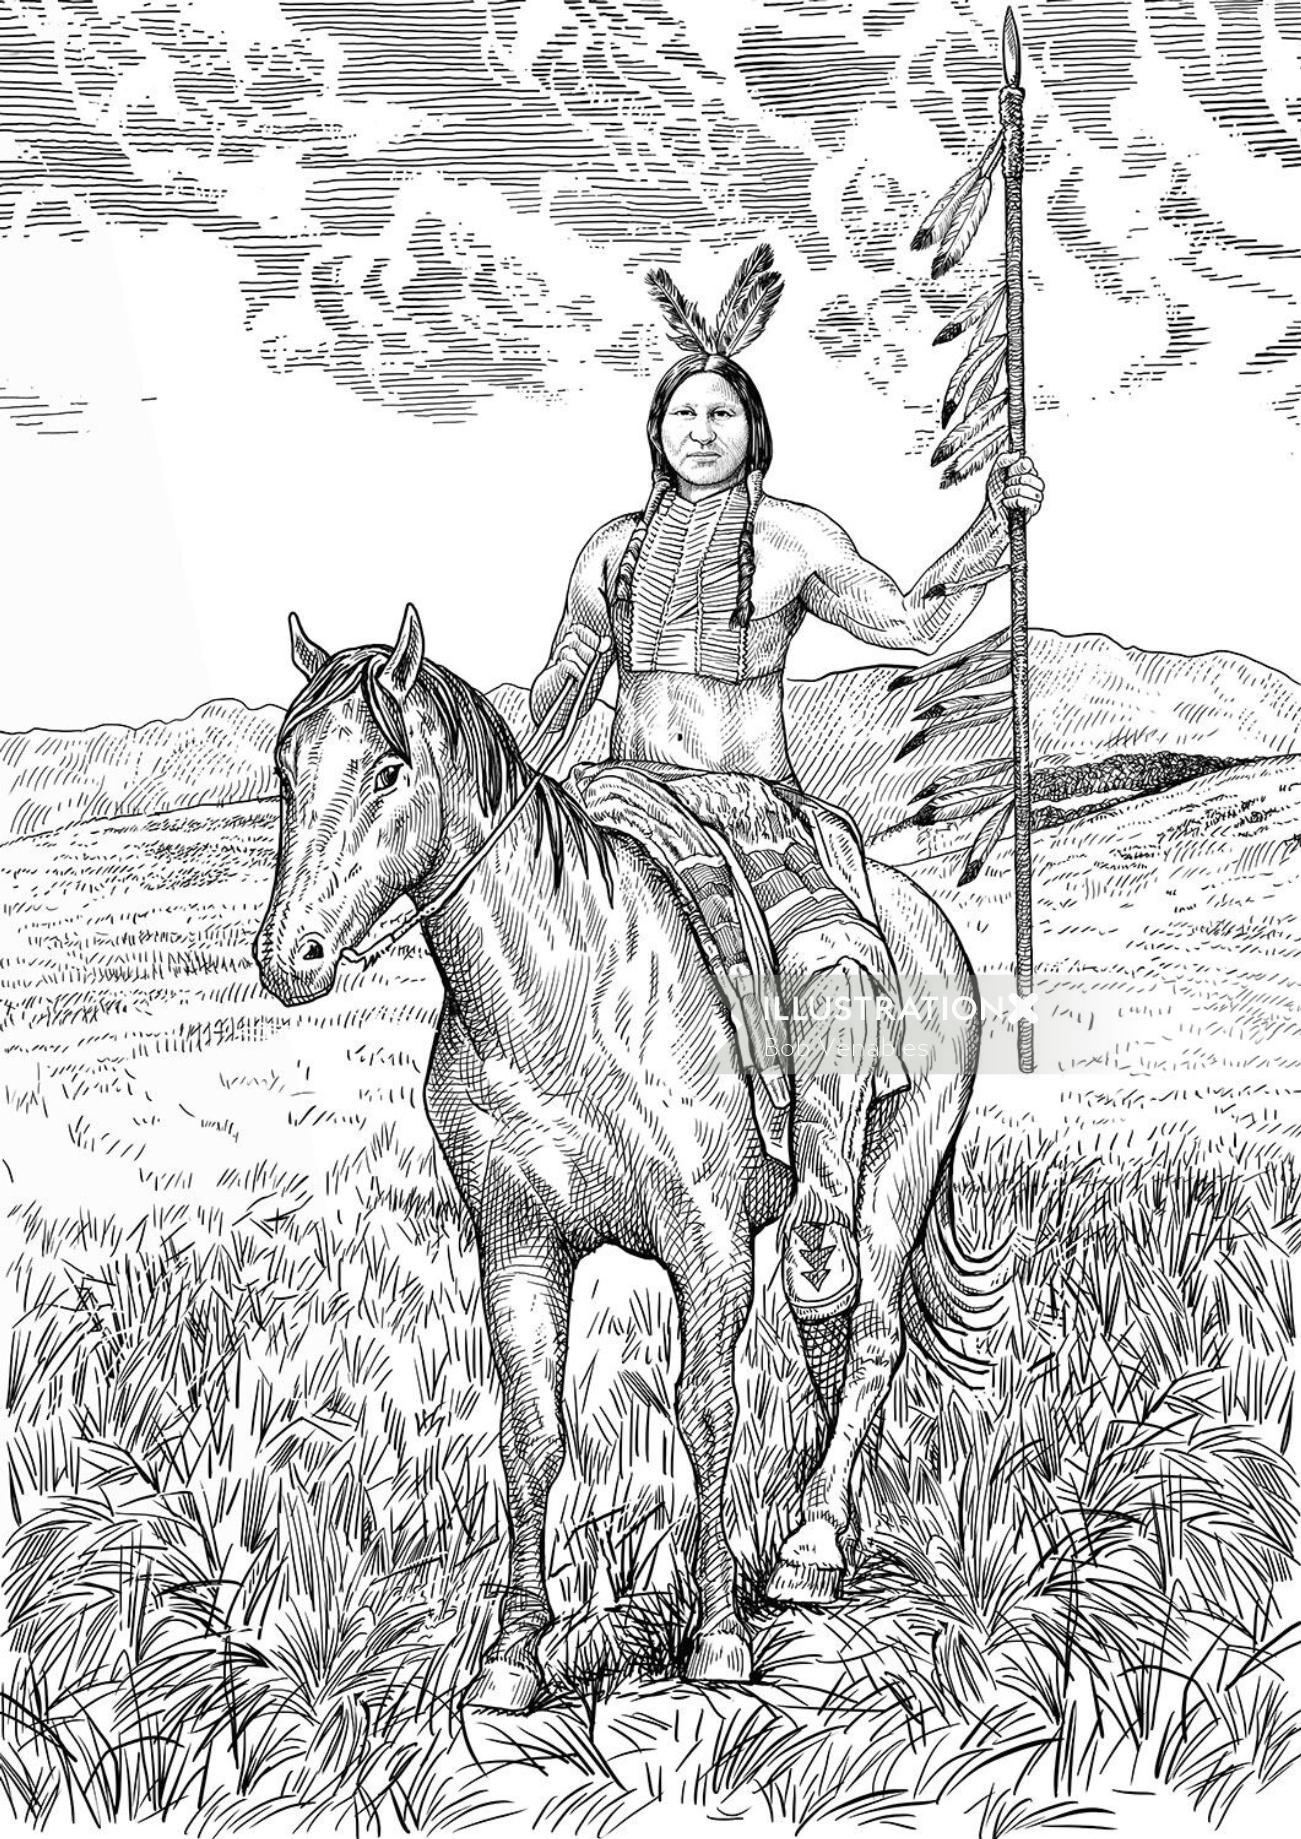 black and white illustration of forest man